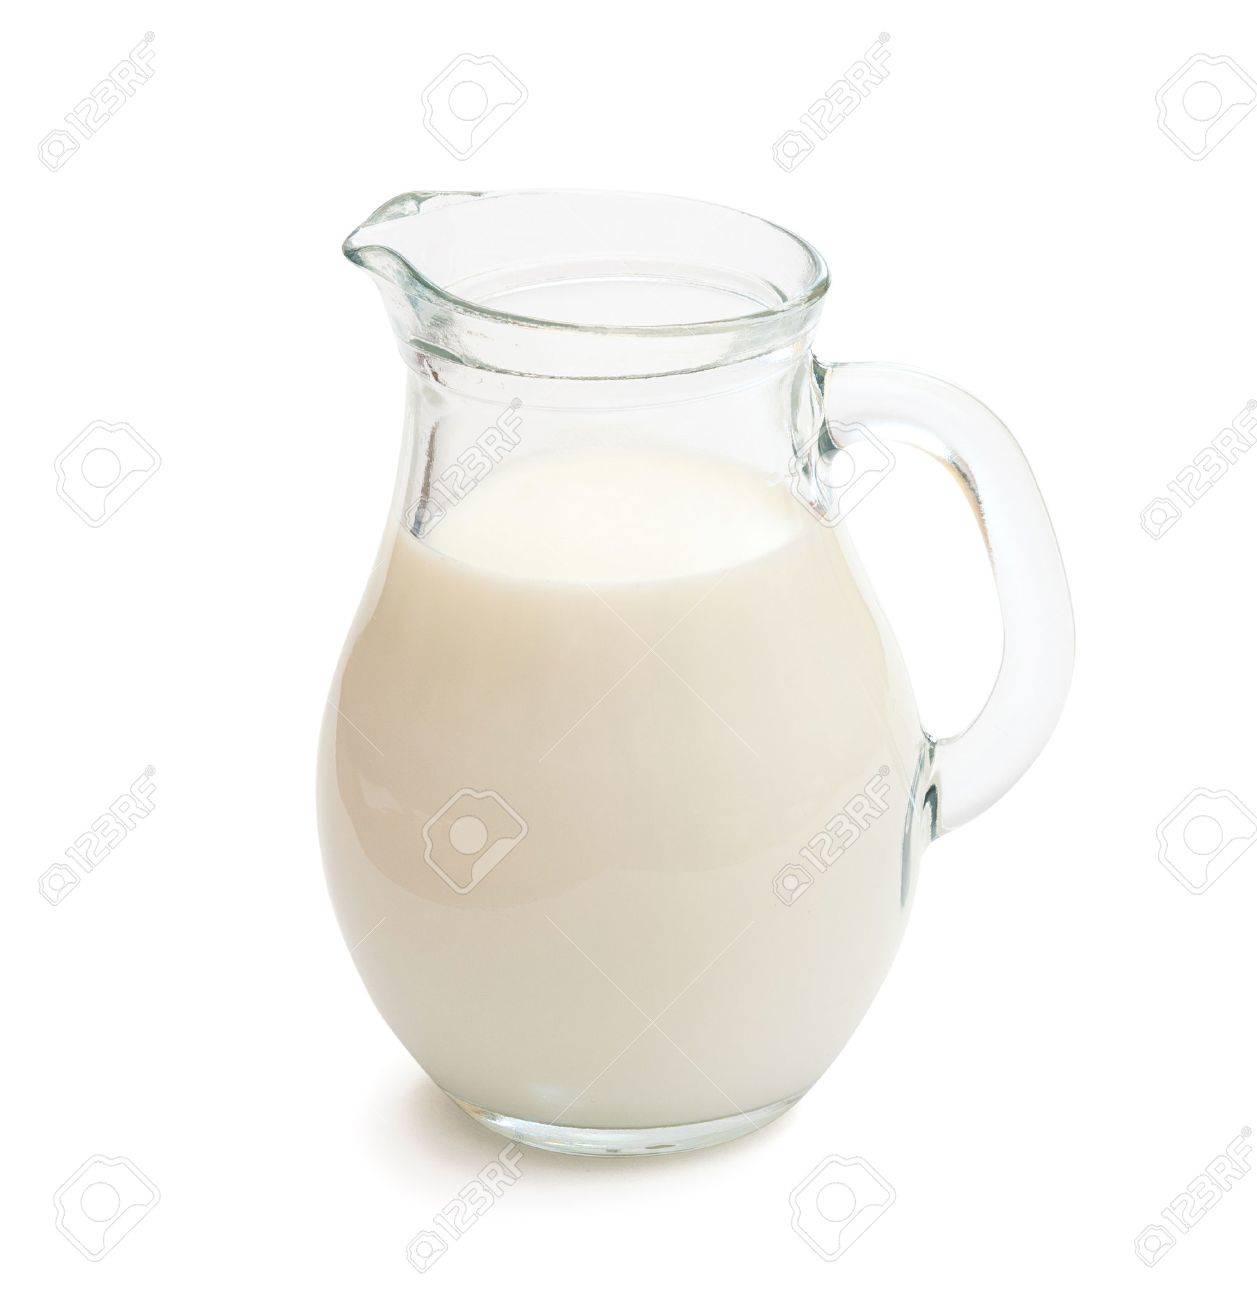 Glass jug of fresh milk isolated on white - 41509851